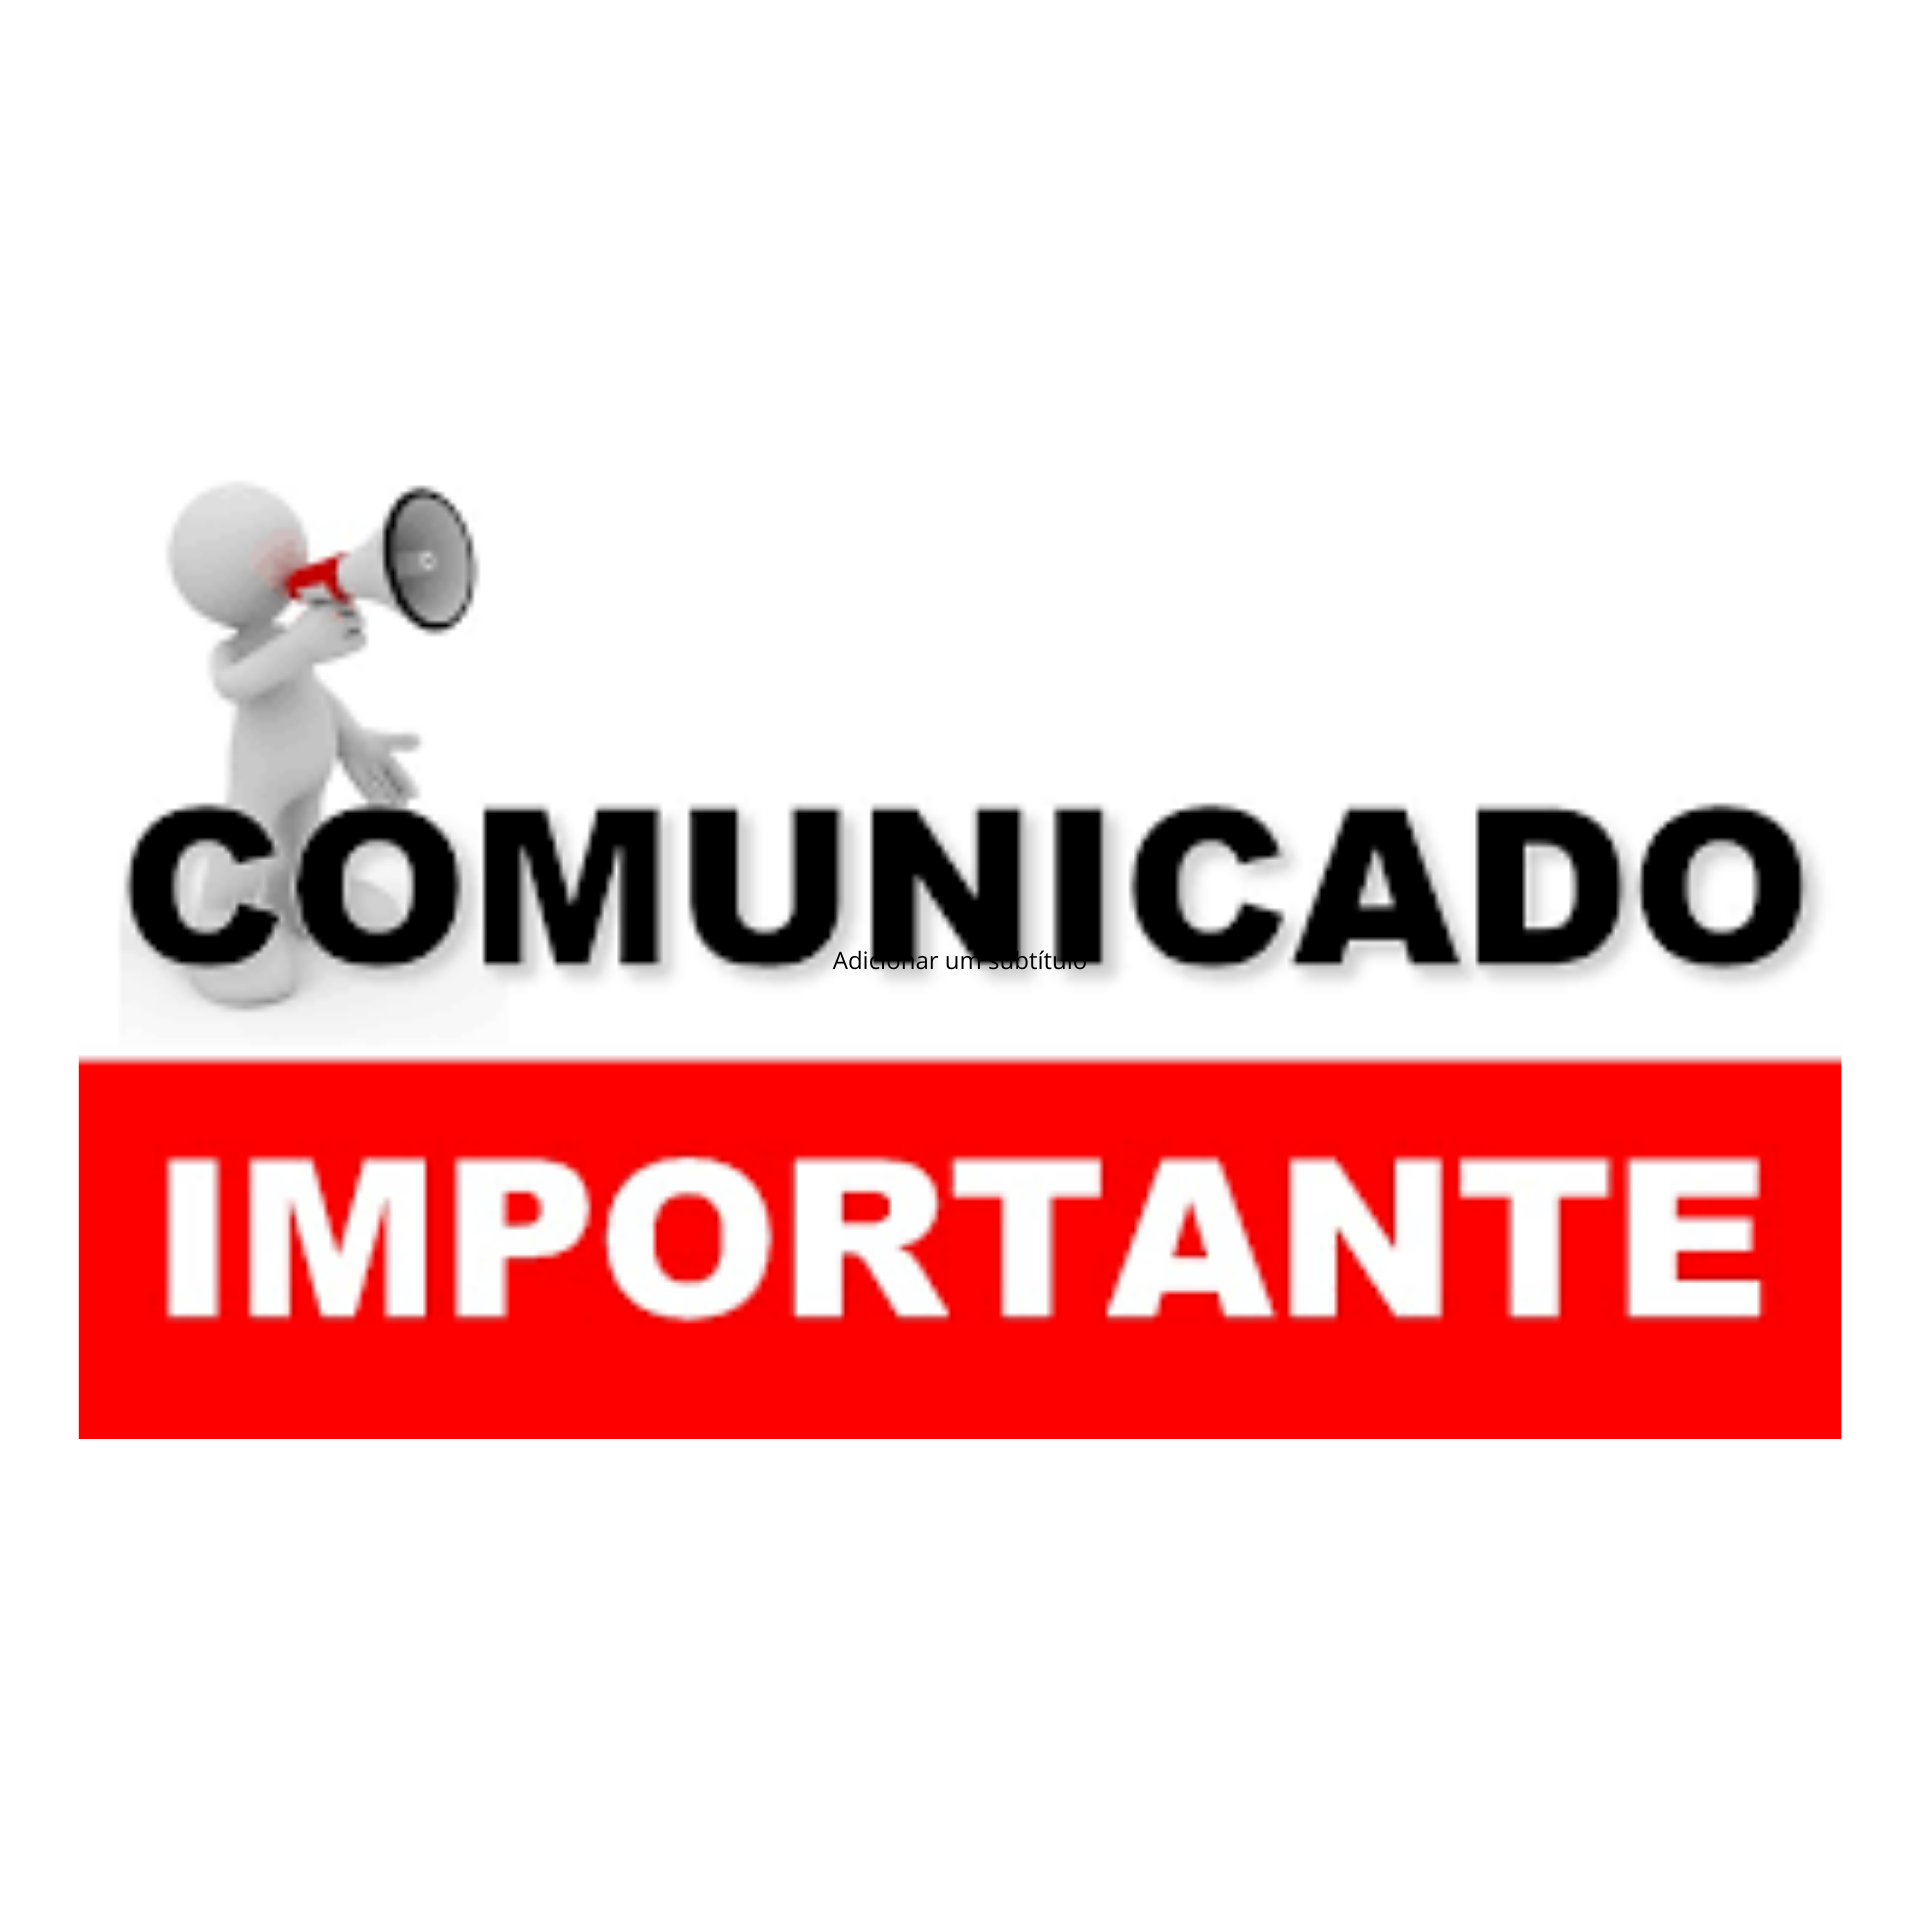 comunicado-importante_5e3b0bf7e8c80.png